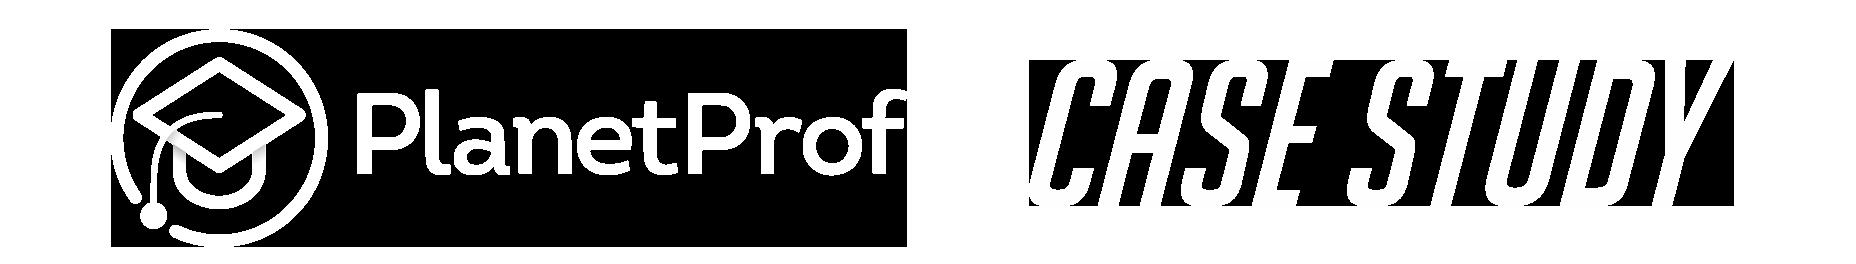 SC-Case-Study-planetprof-logo